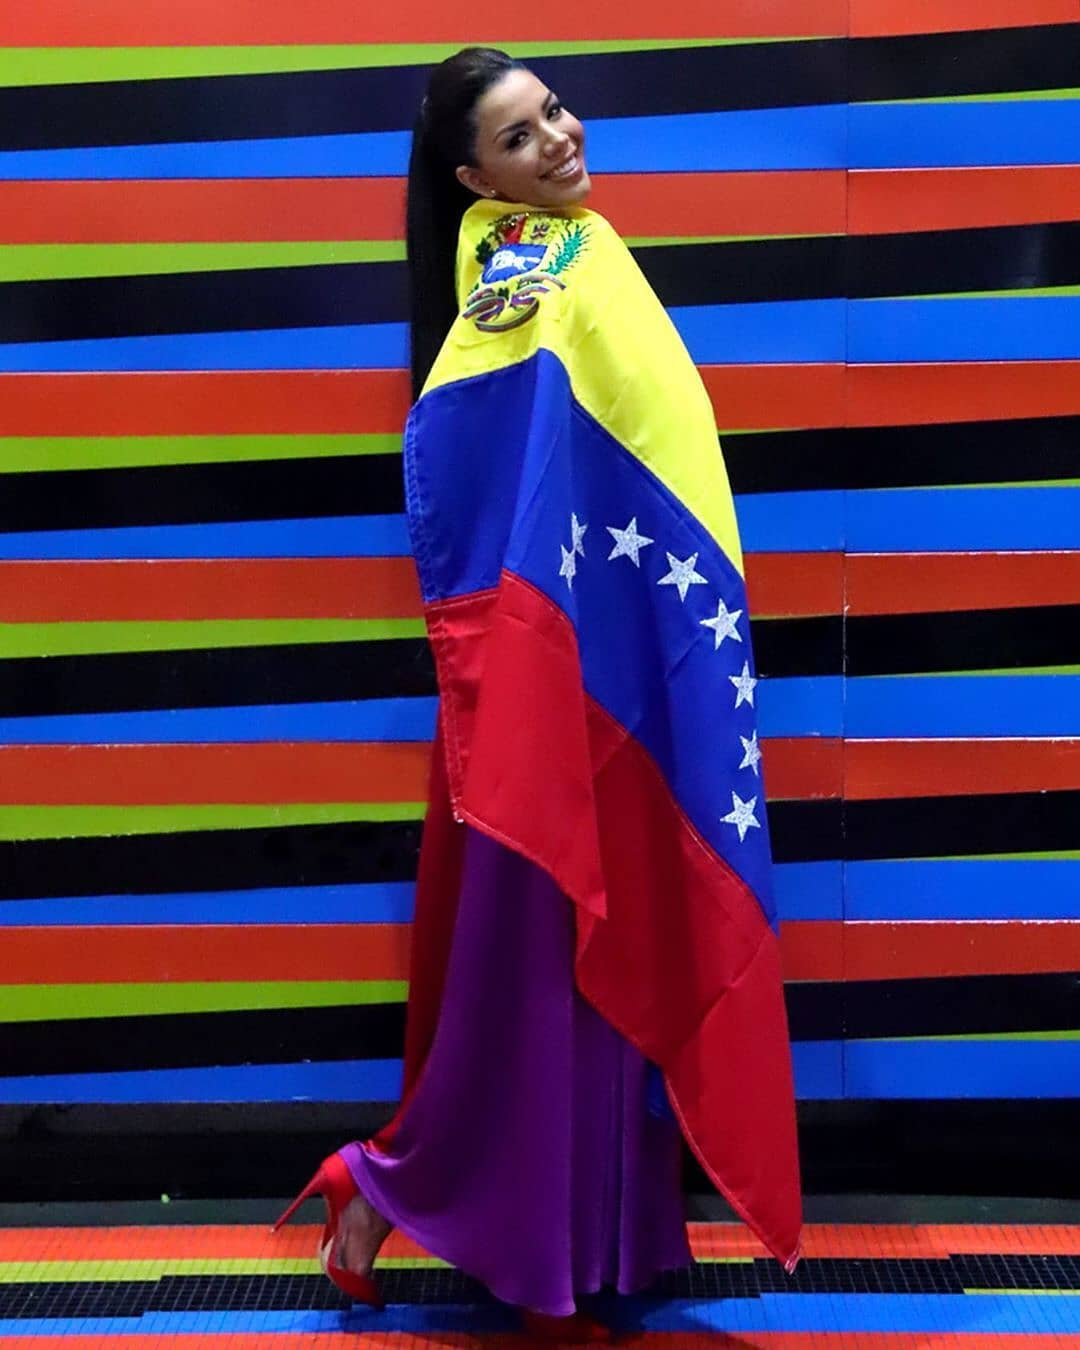 thalia olvino, top 20 de miss universe 2019. - Página 6 74670513